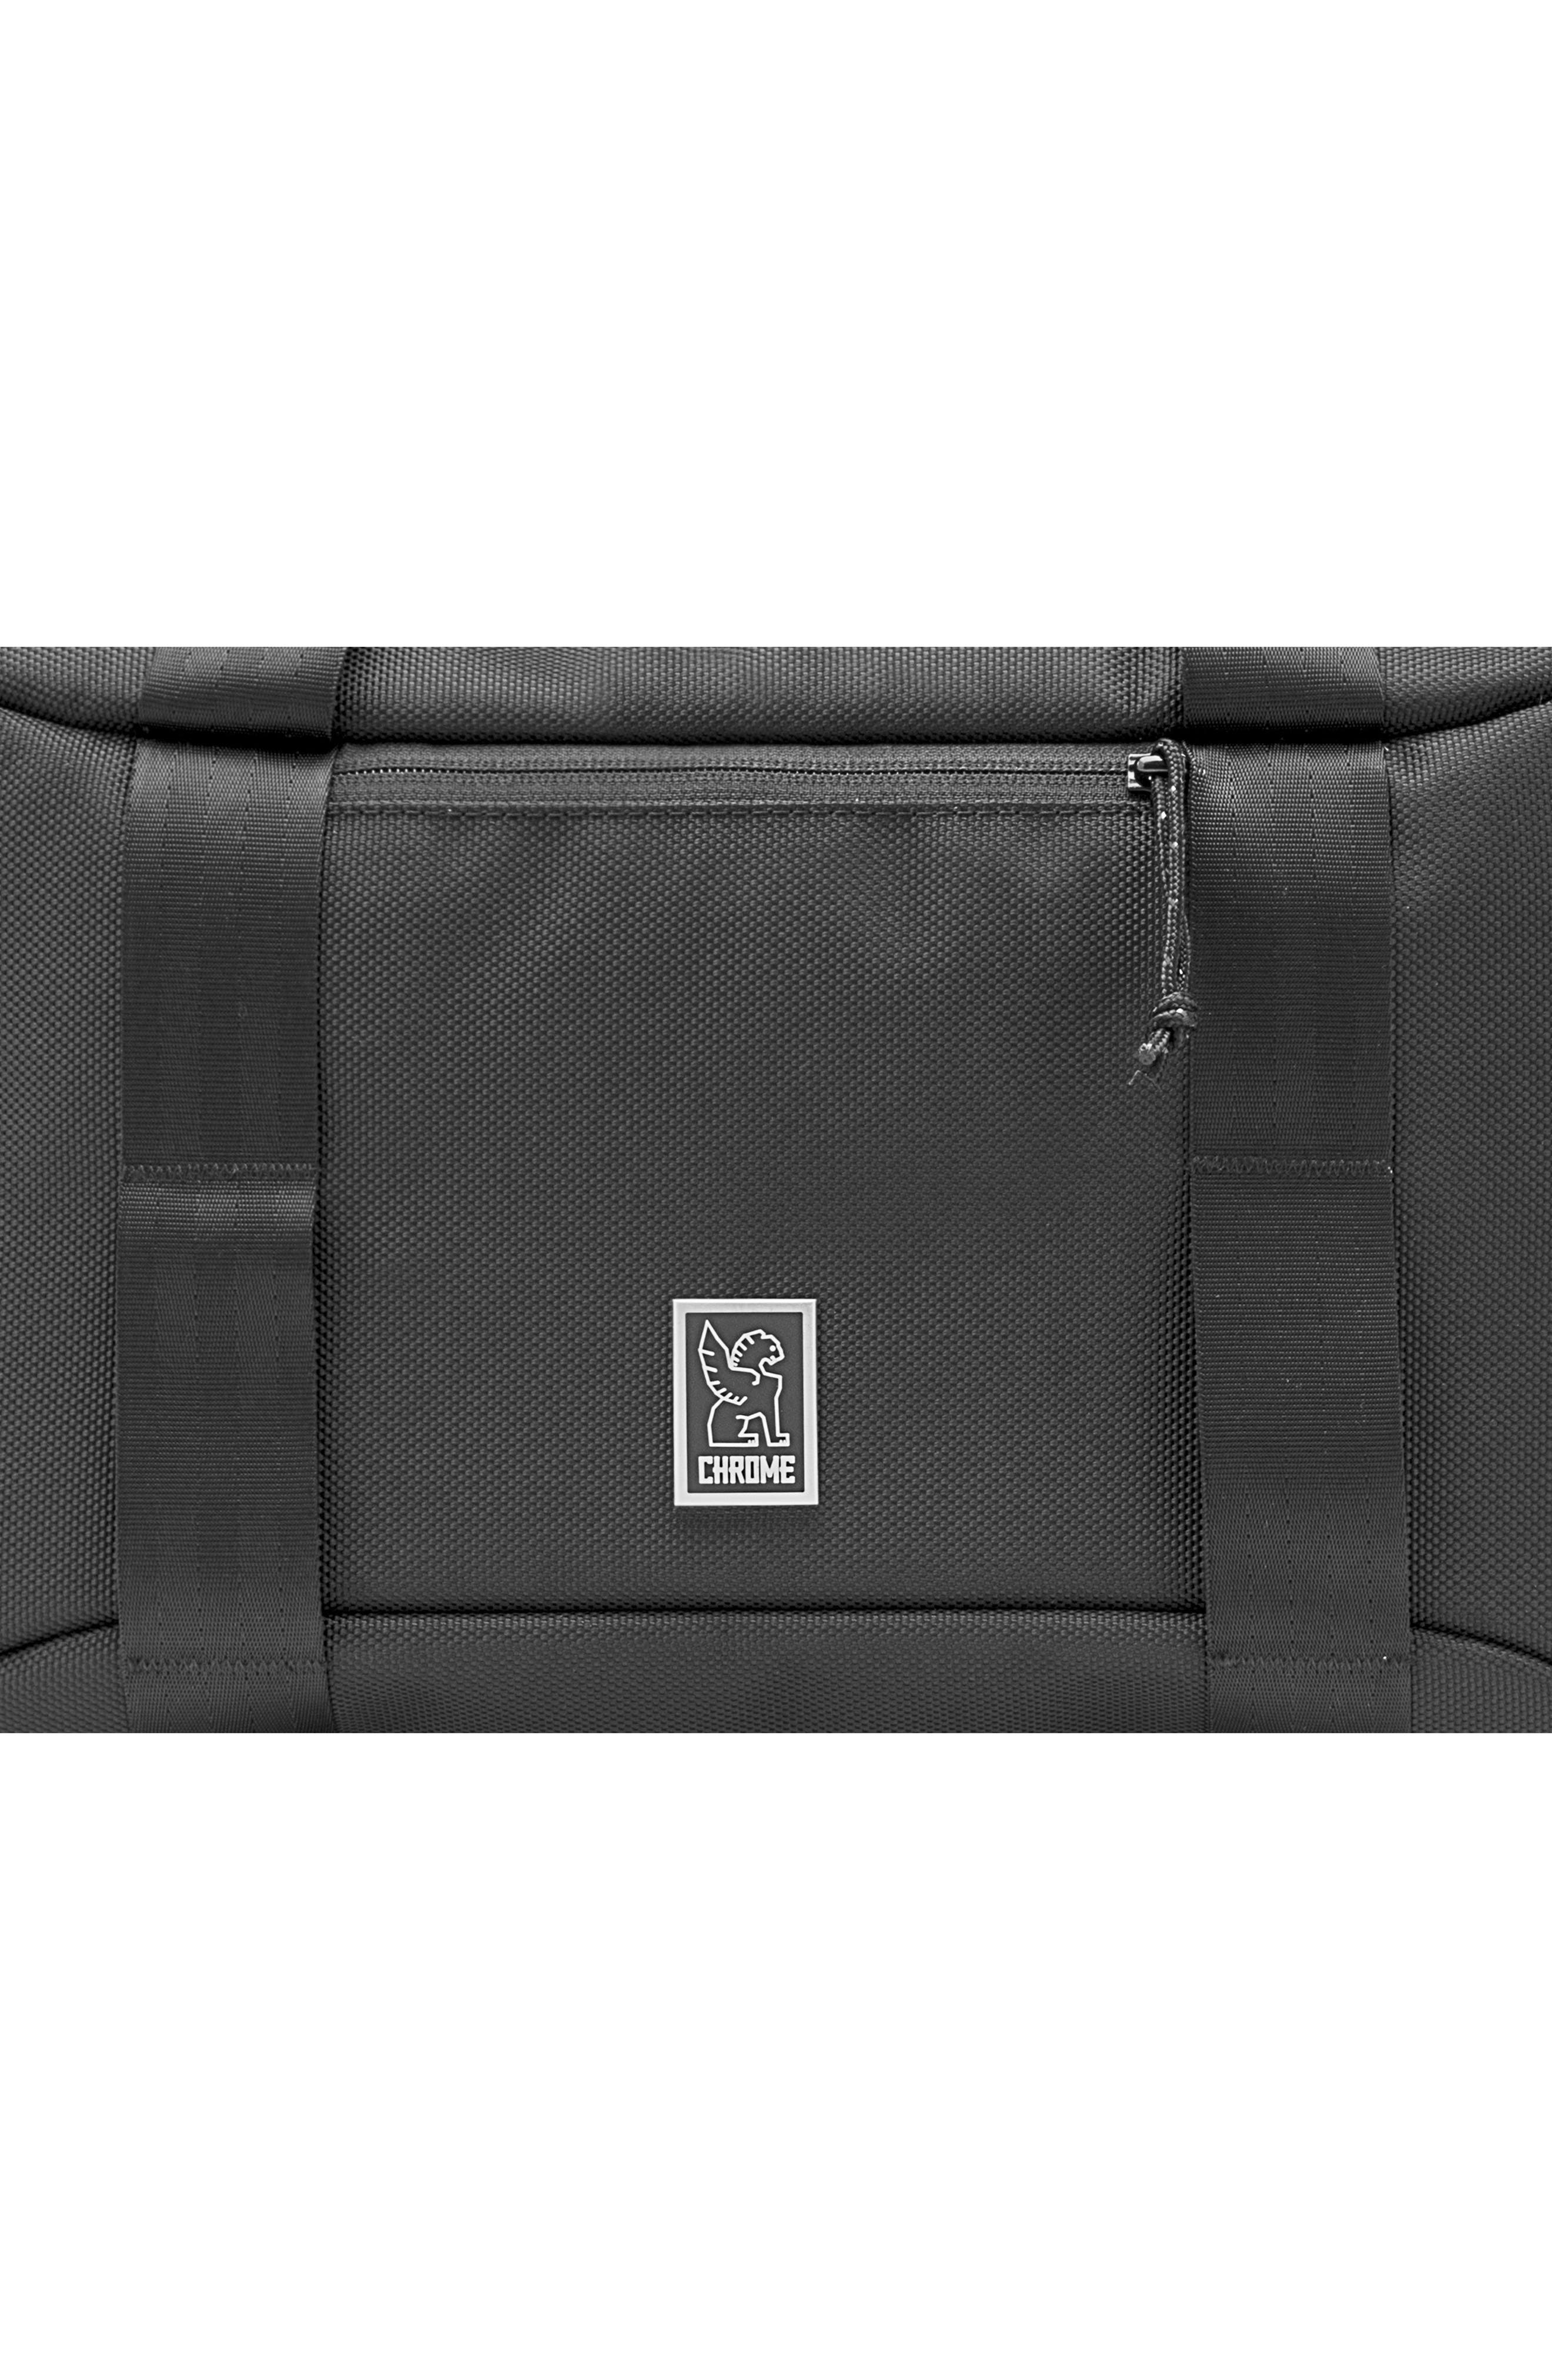 Treadwell Travel Vega Convertible Briefcase,                             Alternate thumbnail 7, color,                             ALL BLACK